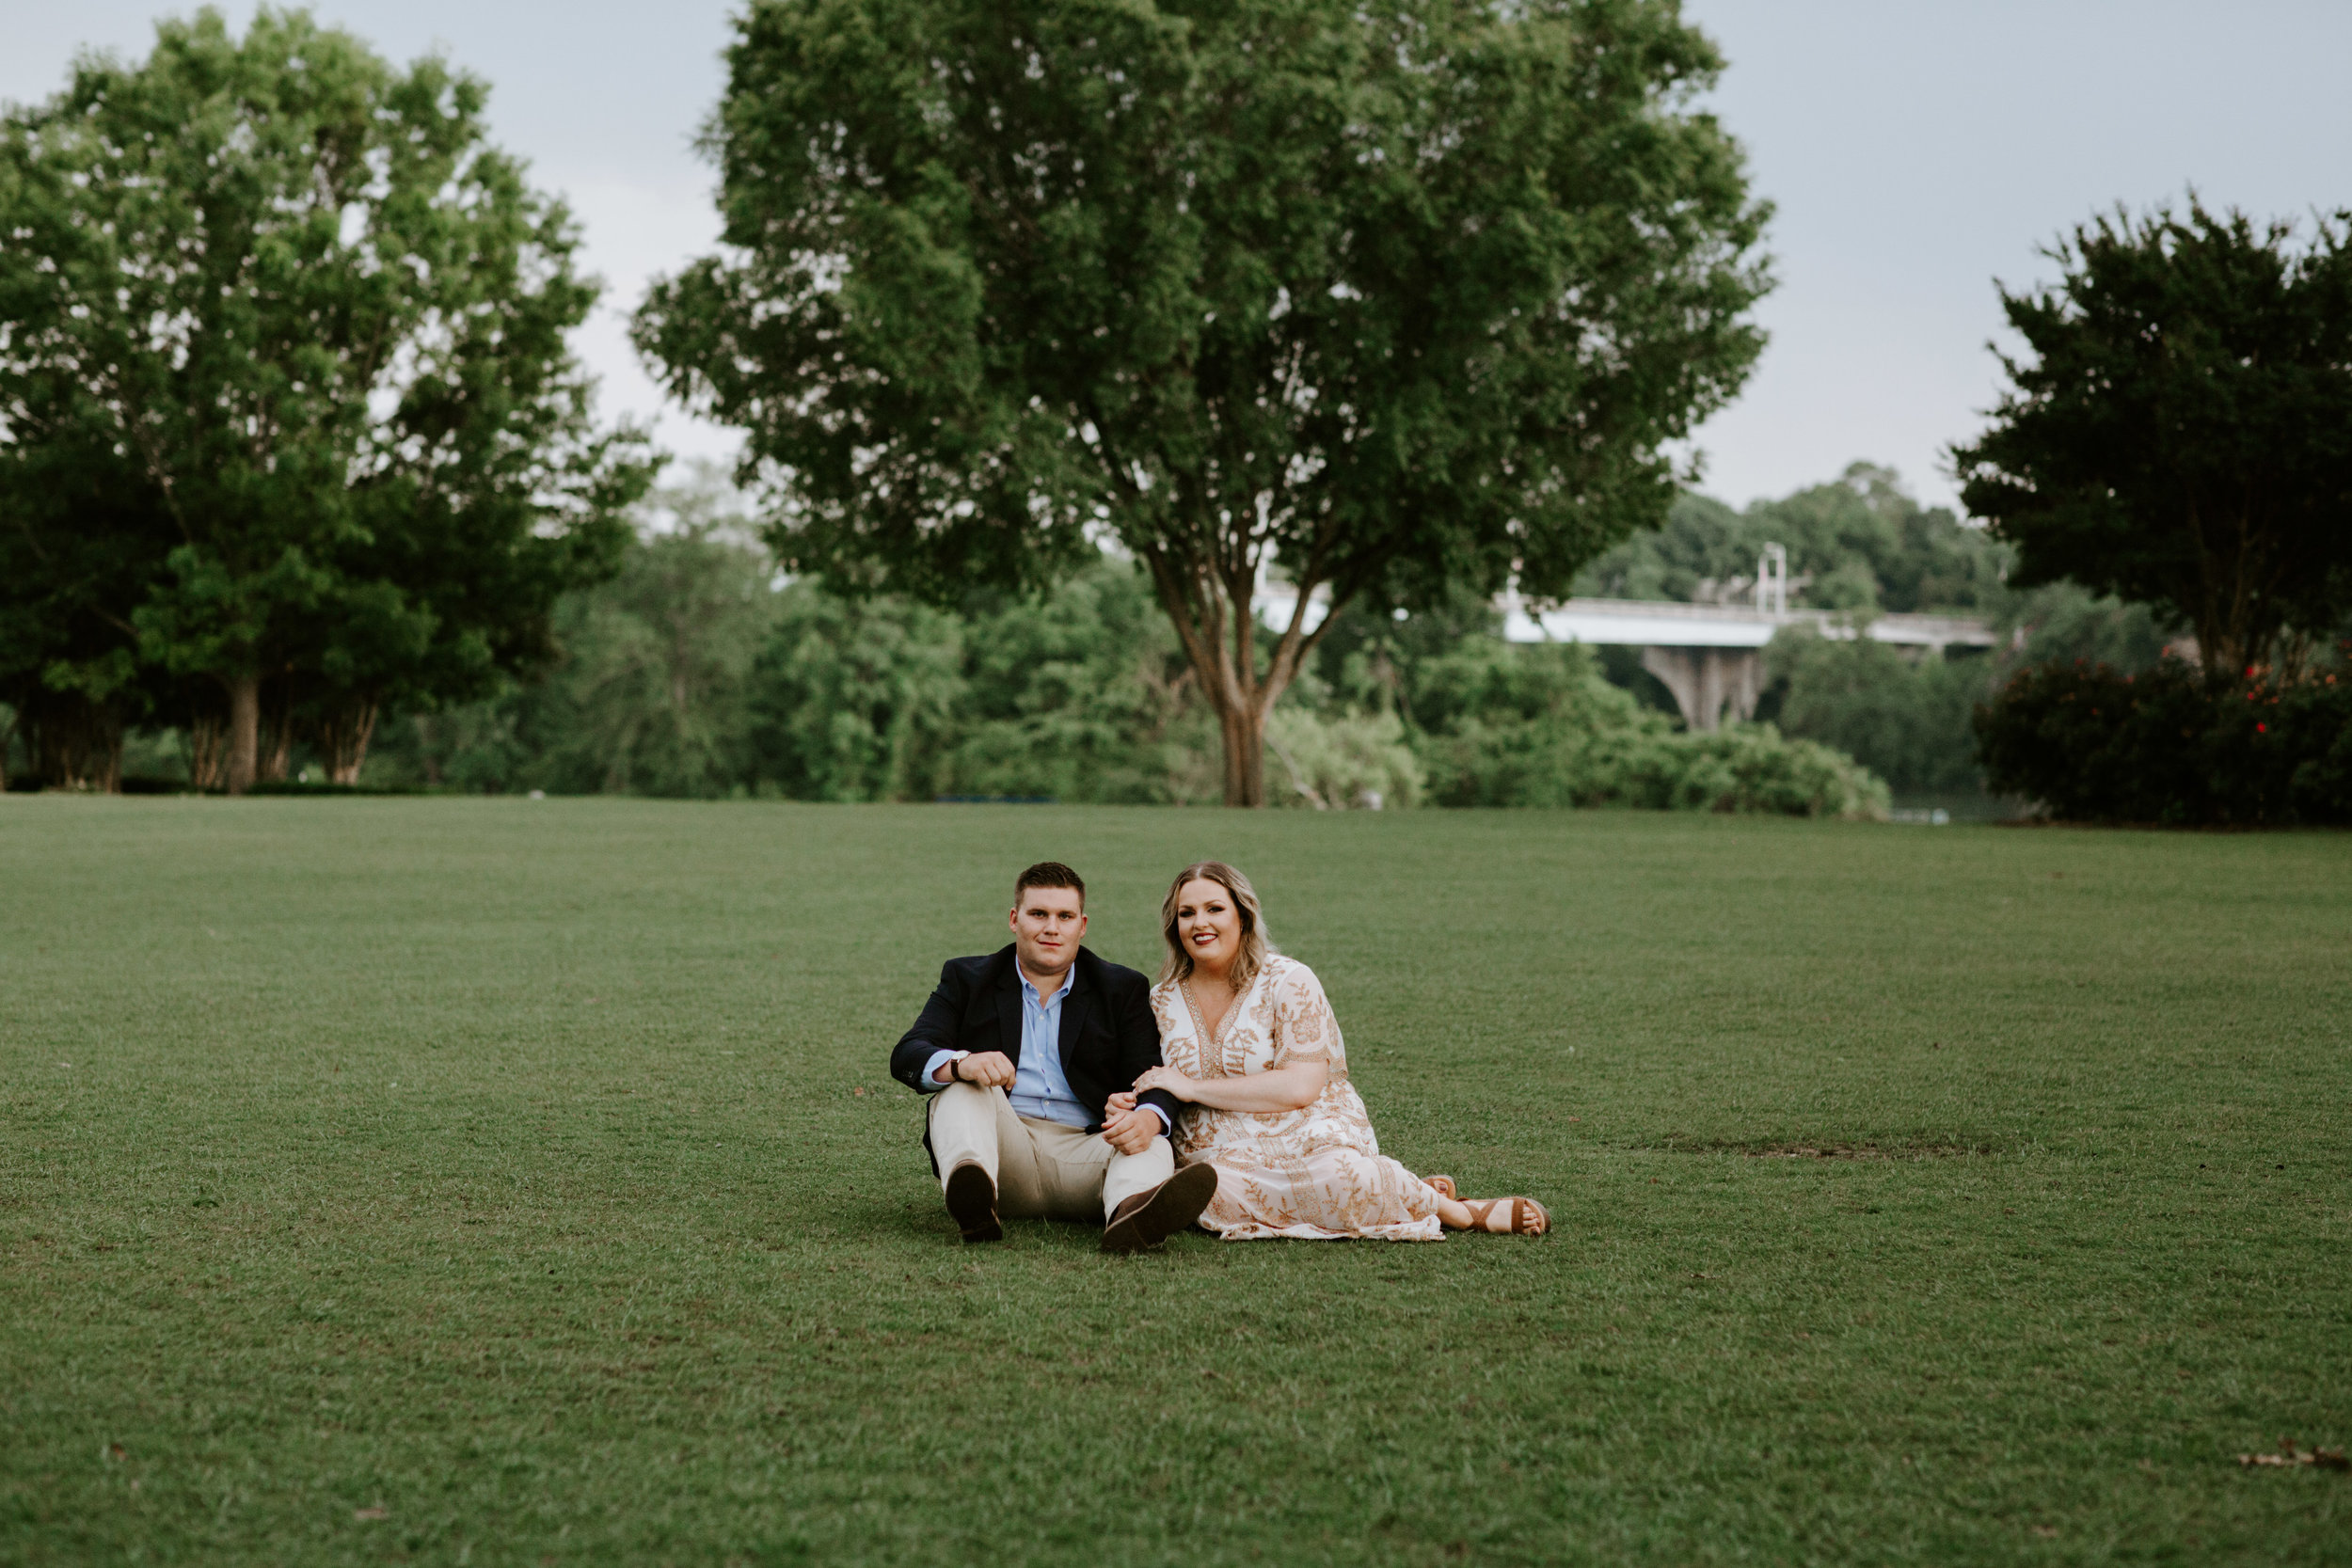 Ryley + Dalton + Chattanooga + Nashville + Knoxville+ Wedding + Engagement + Photographer-75.jpg